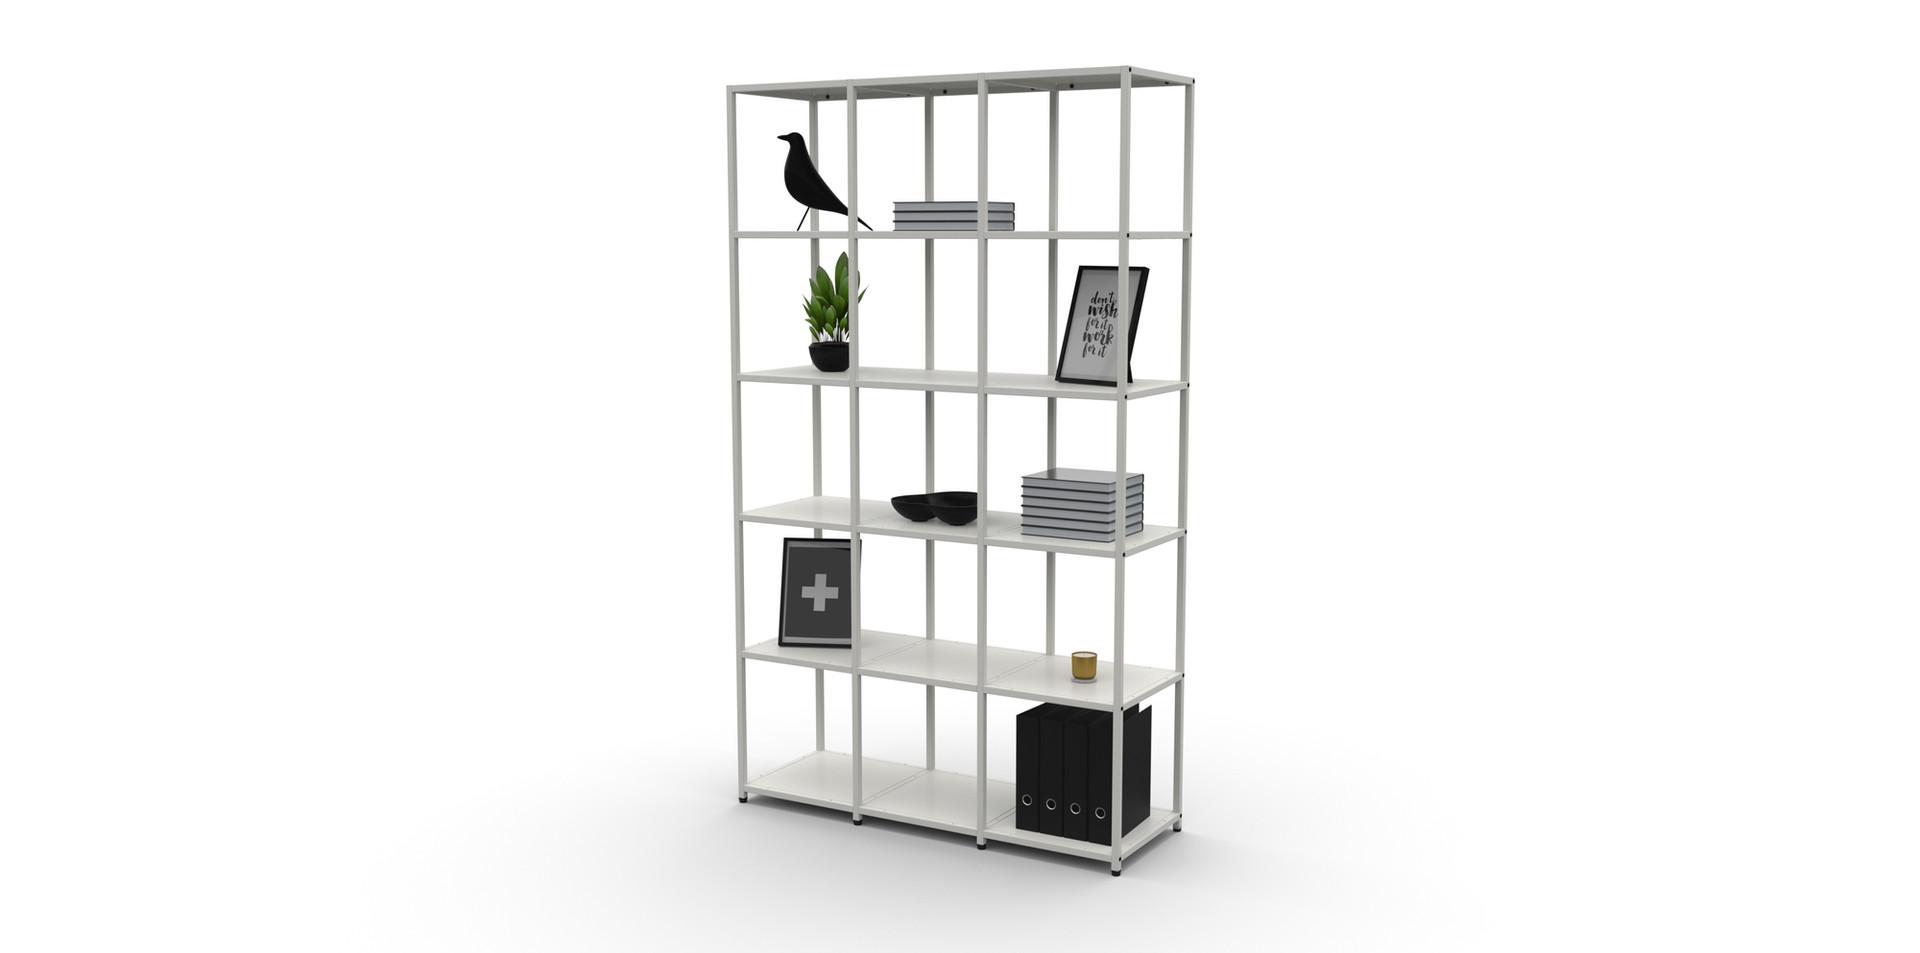 1220 x 1655h Shelf Unit.jpg